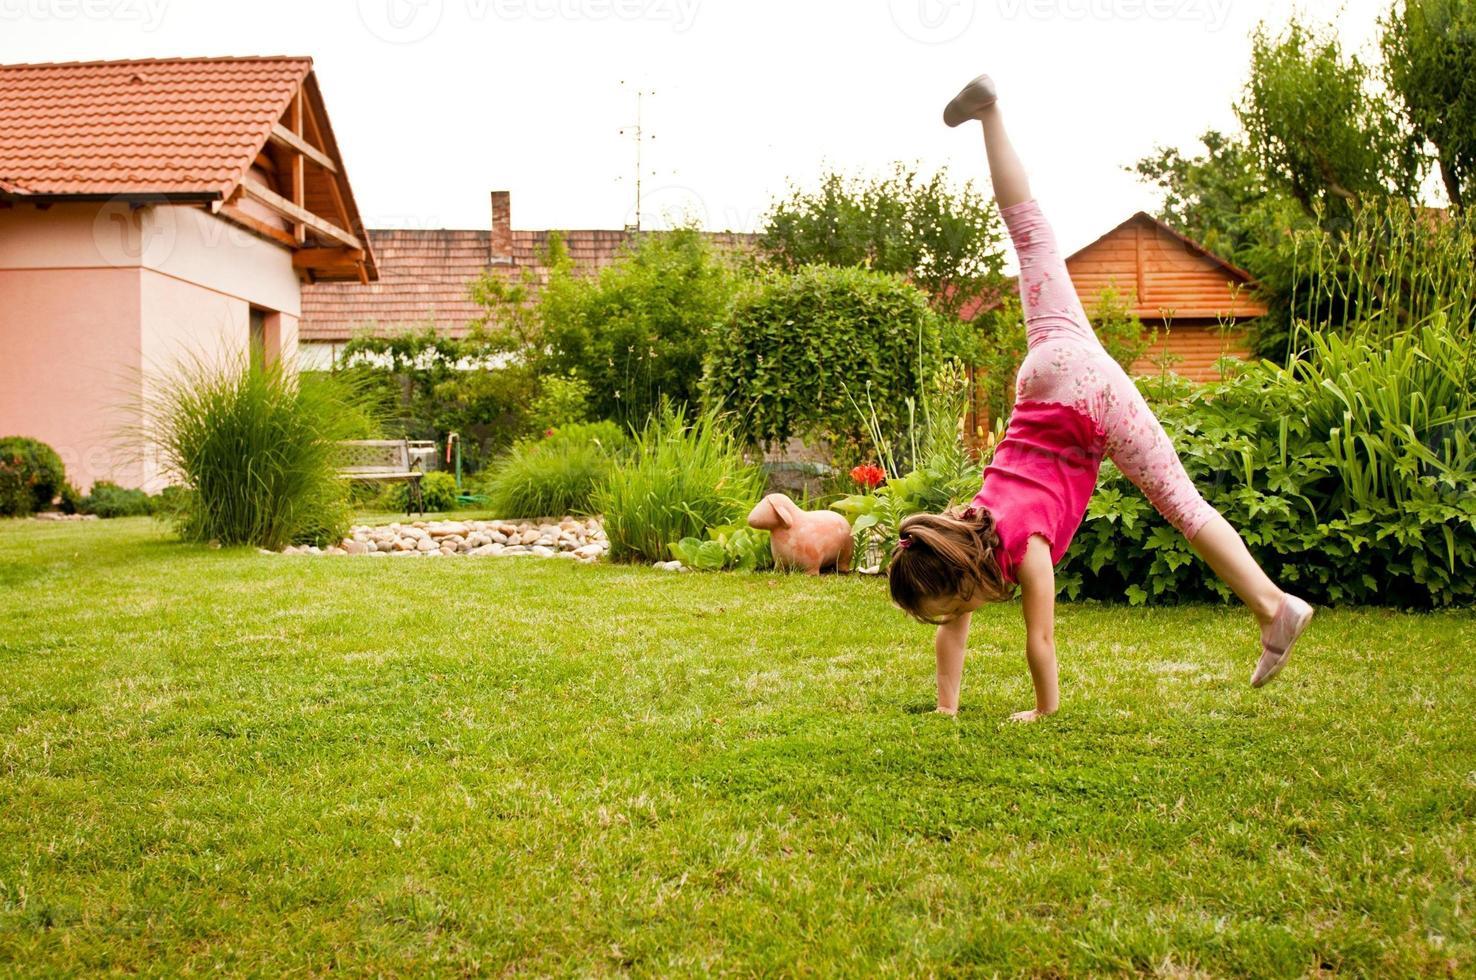 Child doing cartwheel in backyard photo